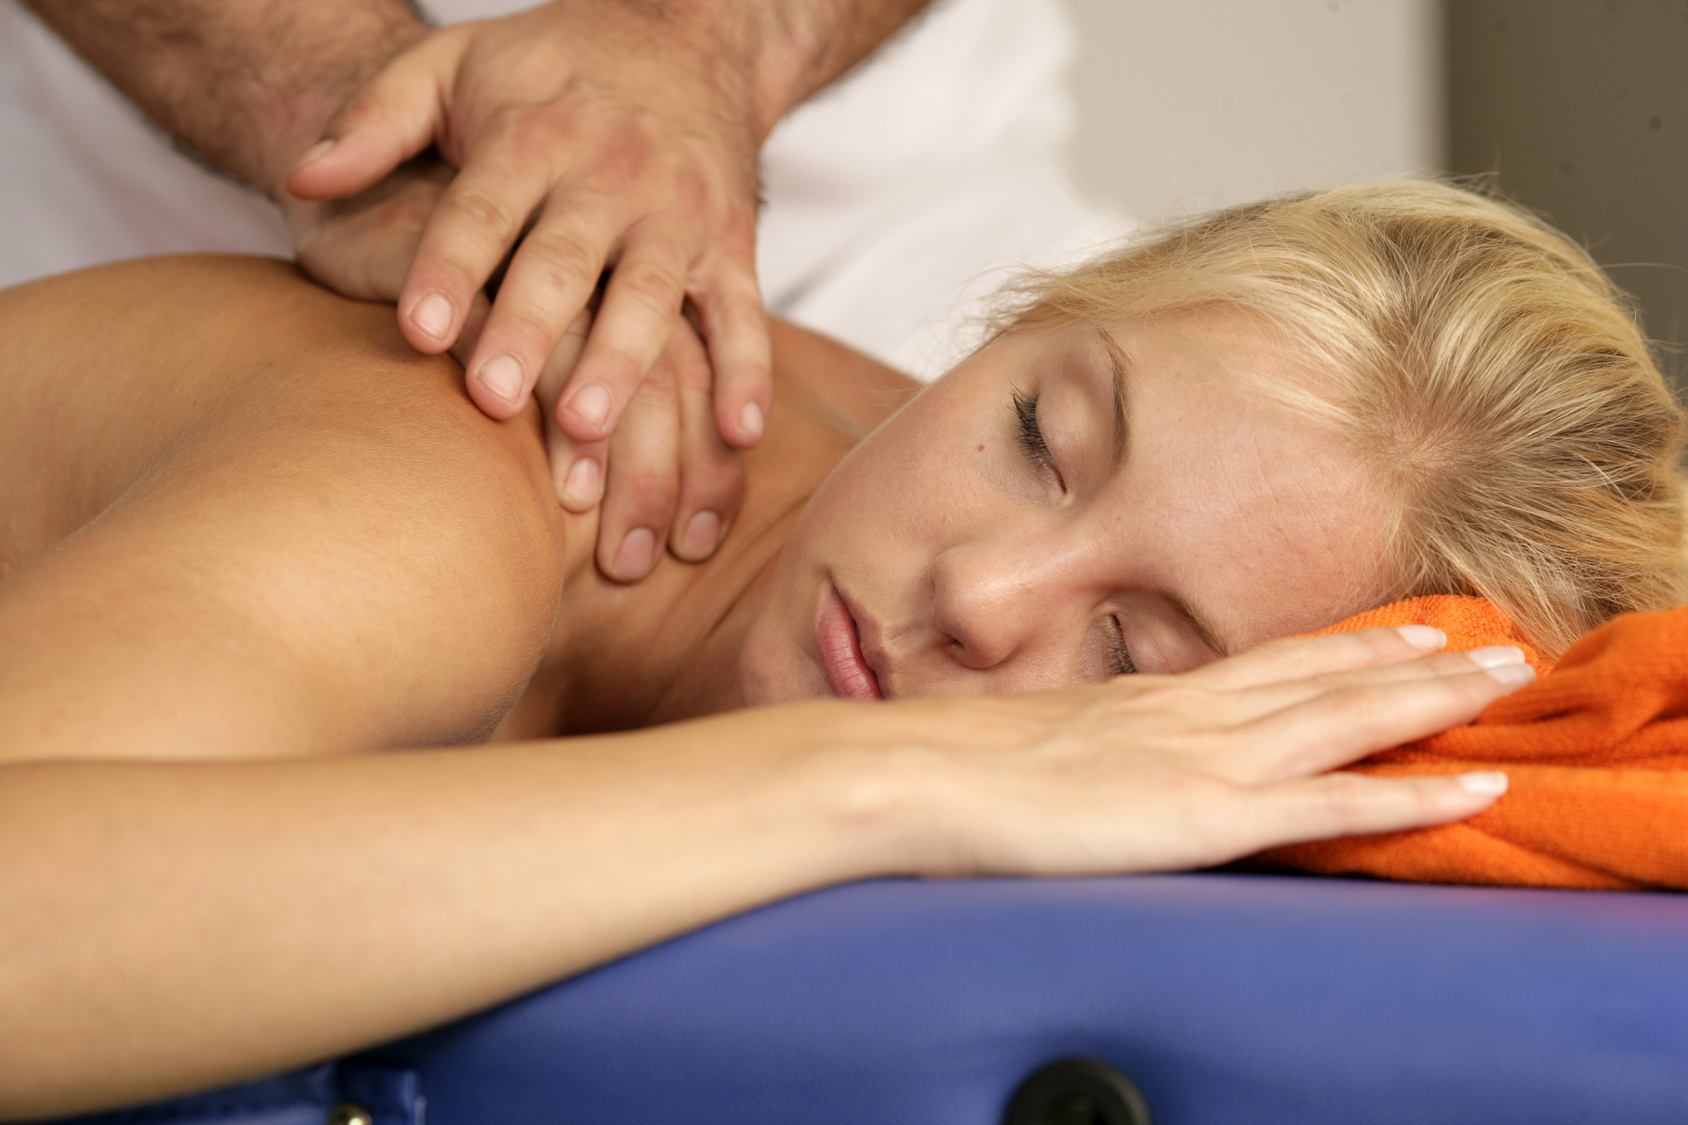 thai hieronta malmi gay massage tube